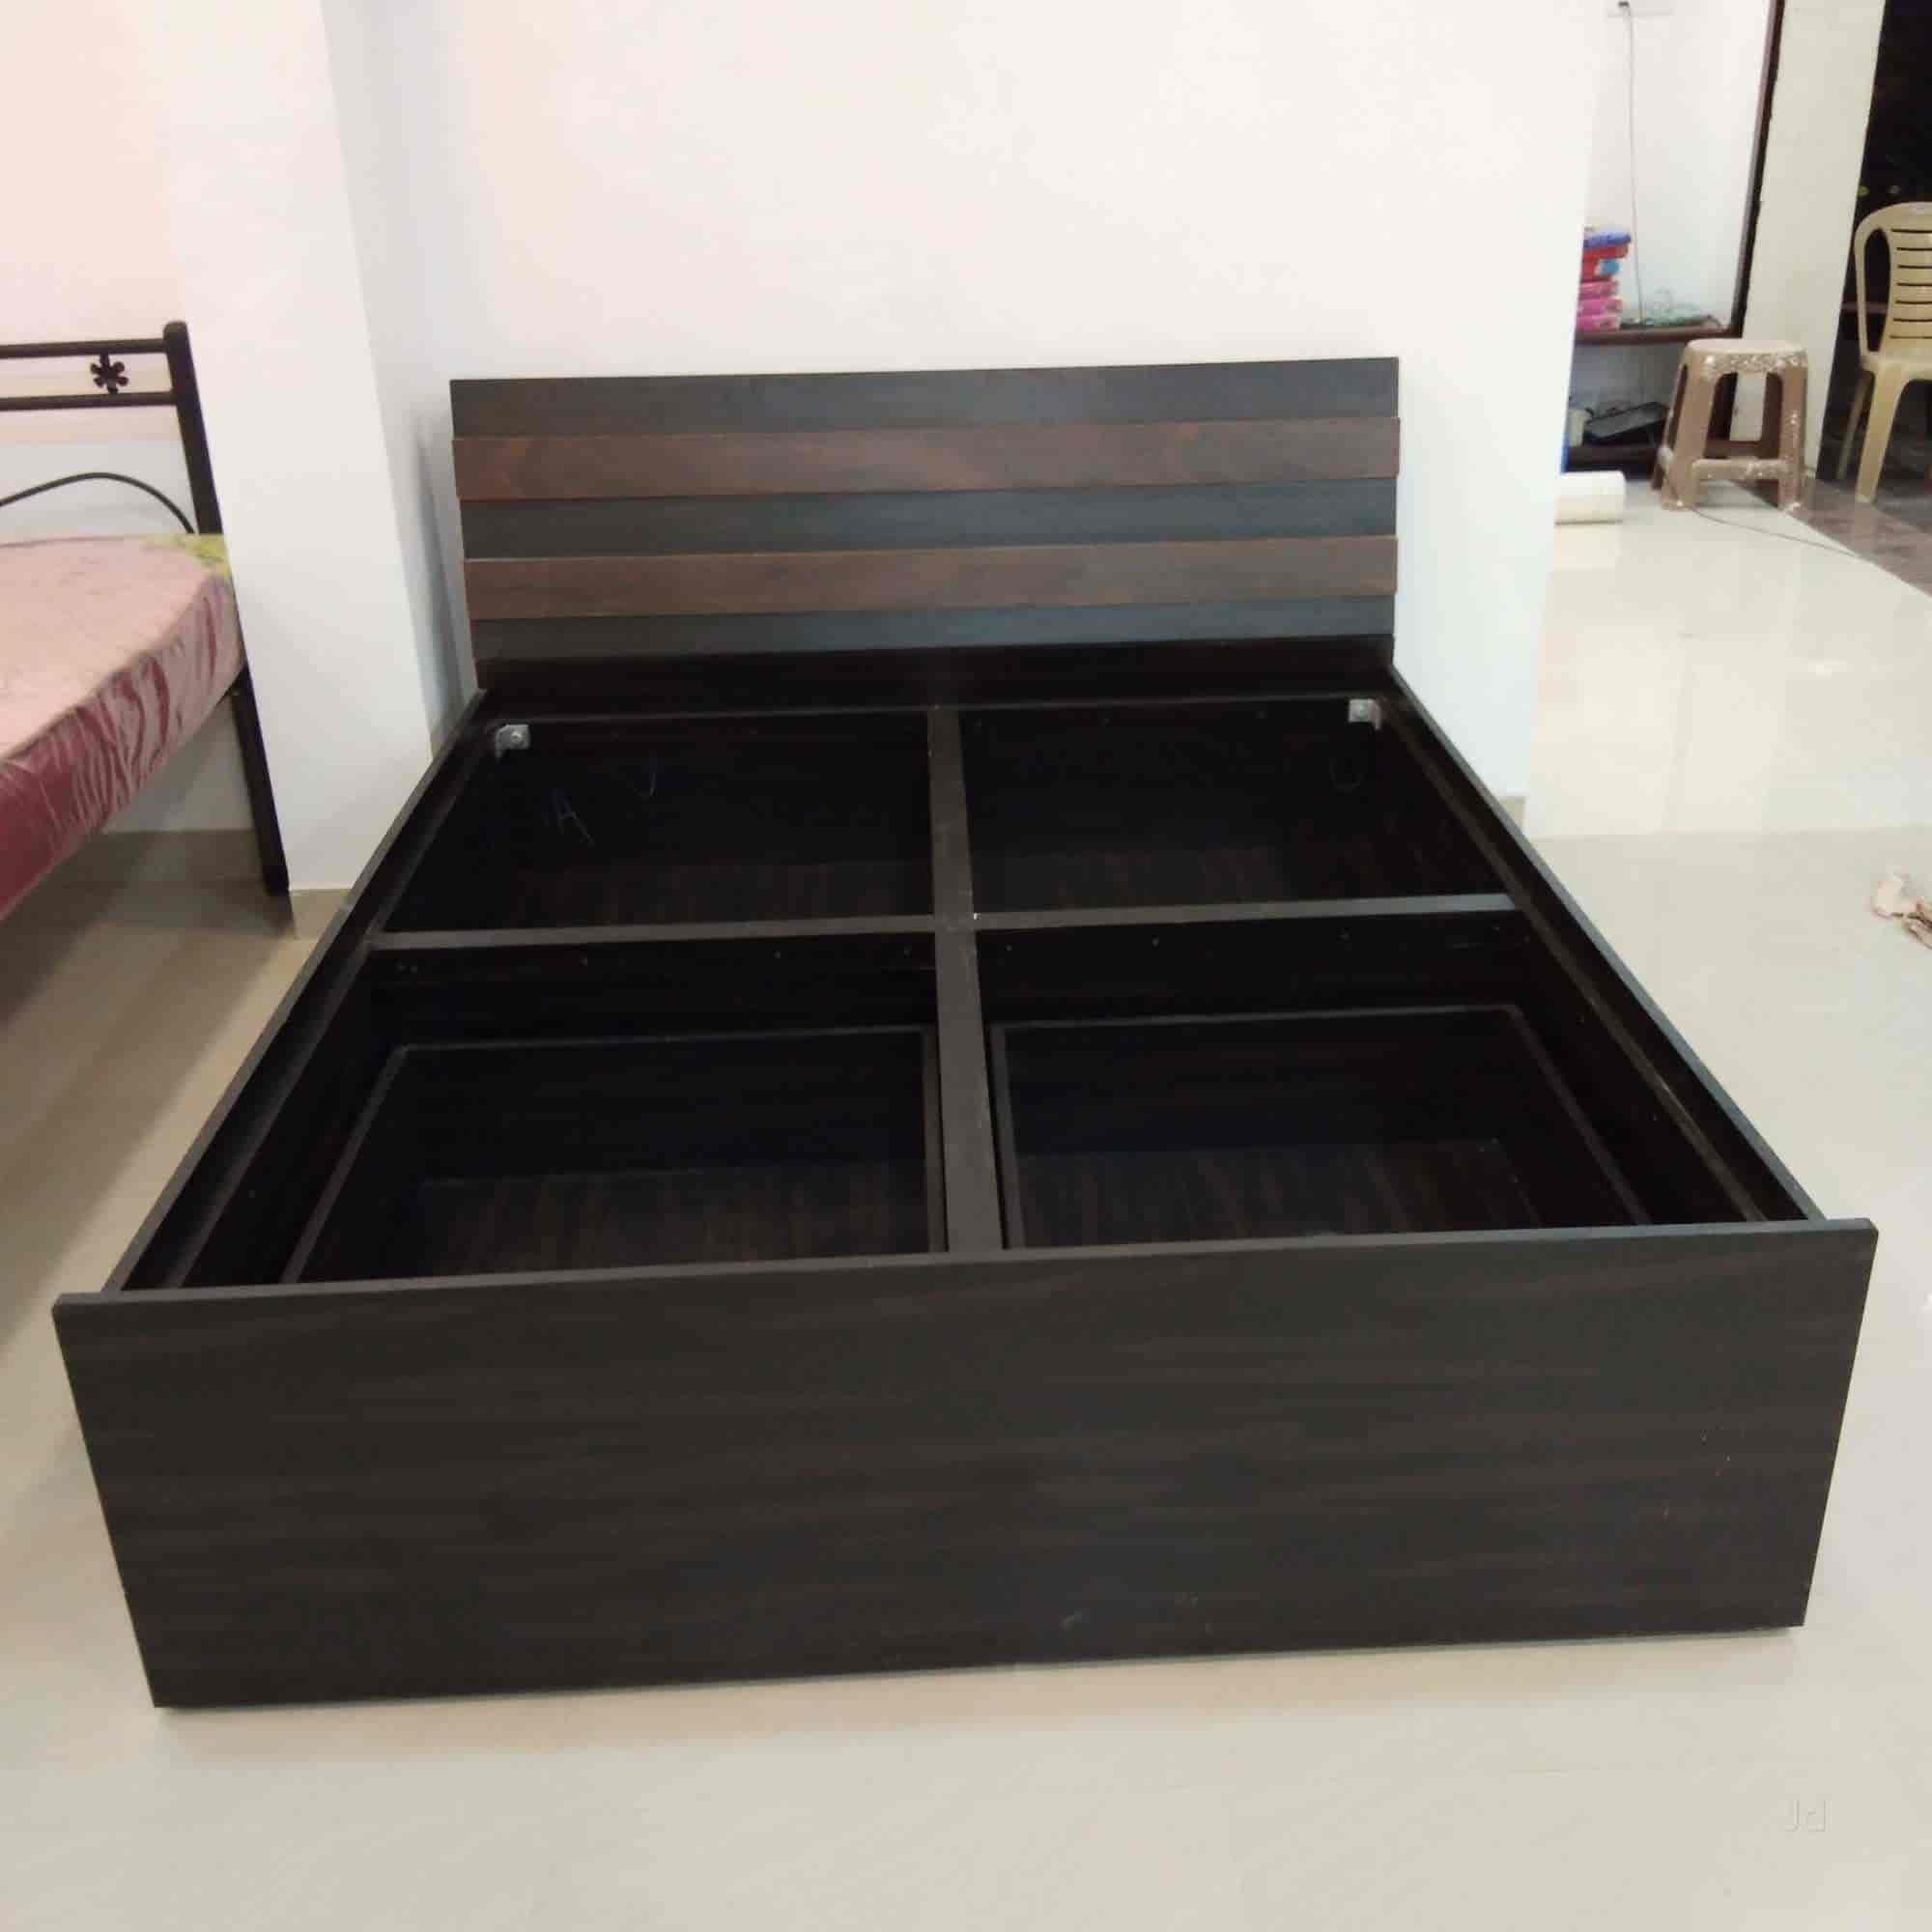 VK Decore, Siolim - Interior Designers in Goa - Justdial